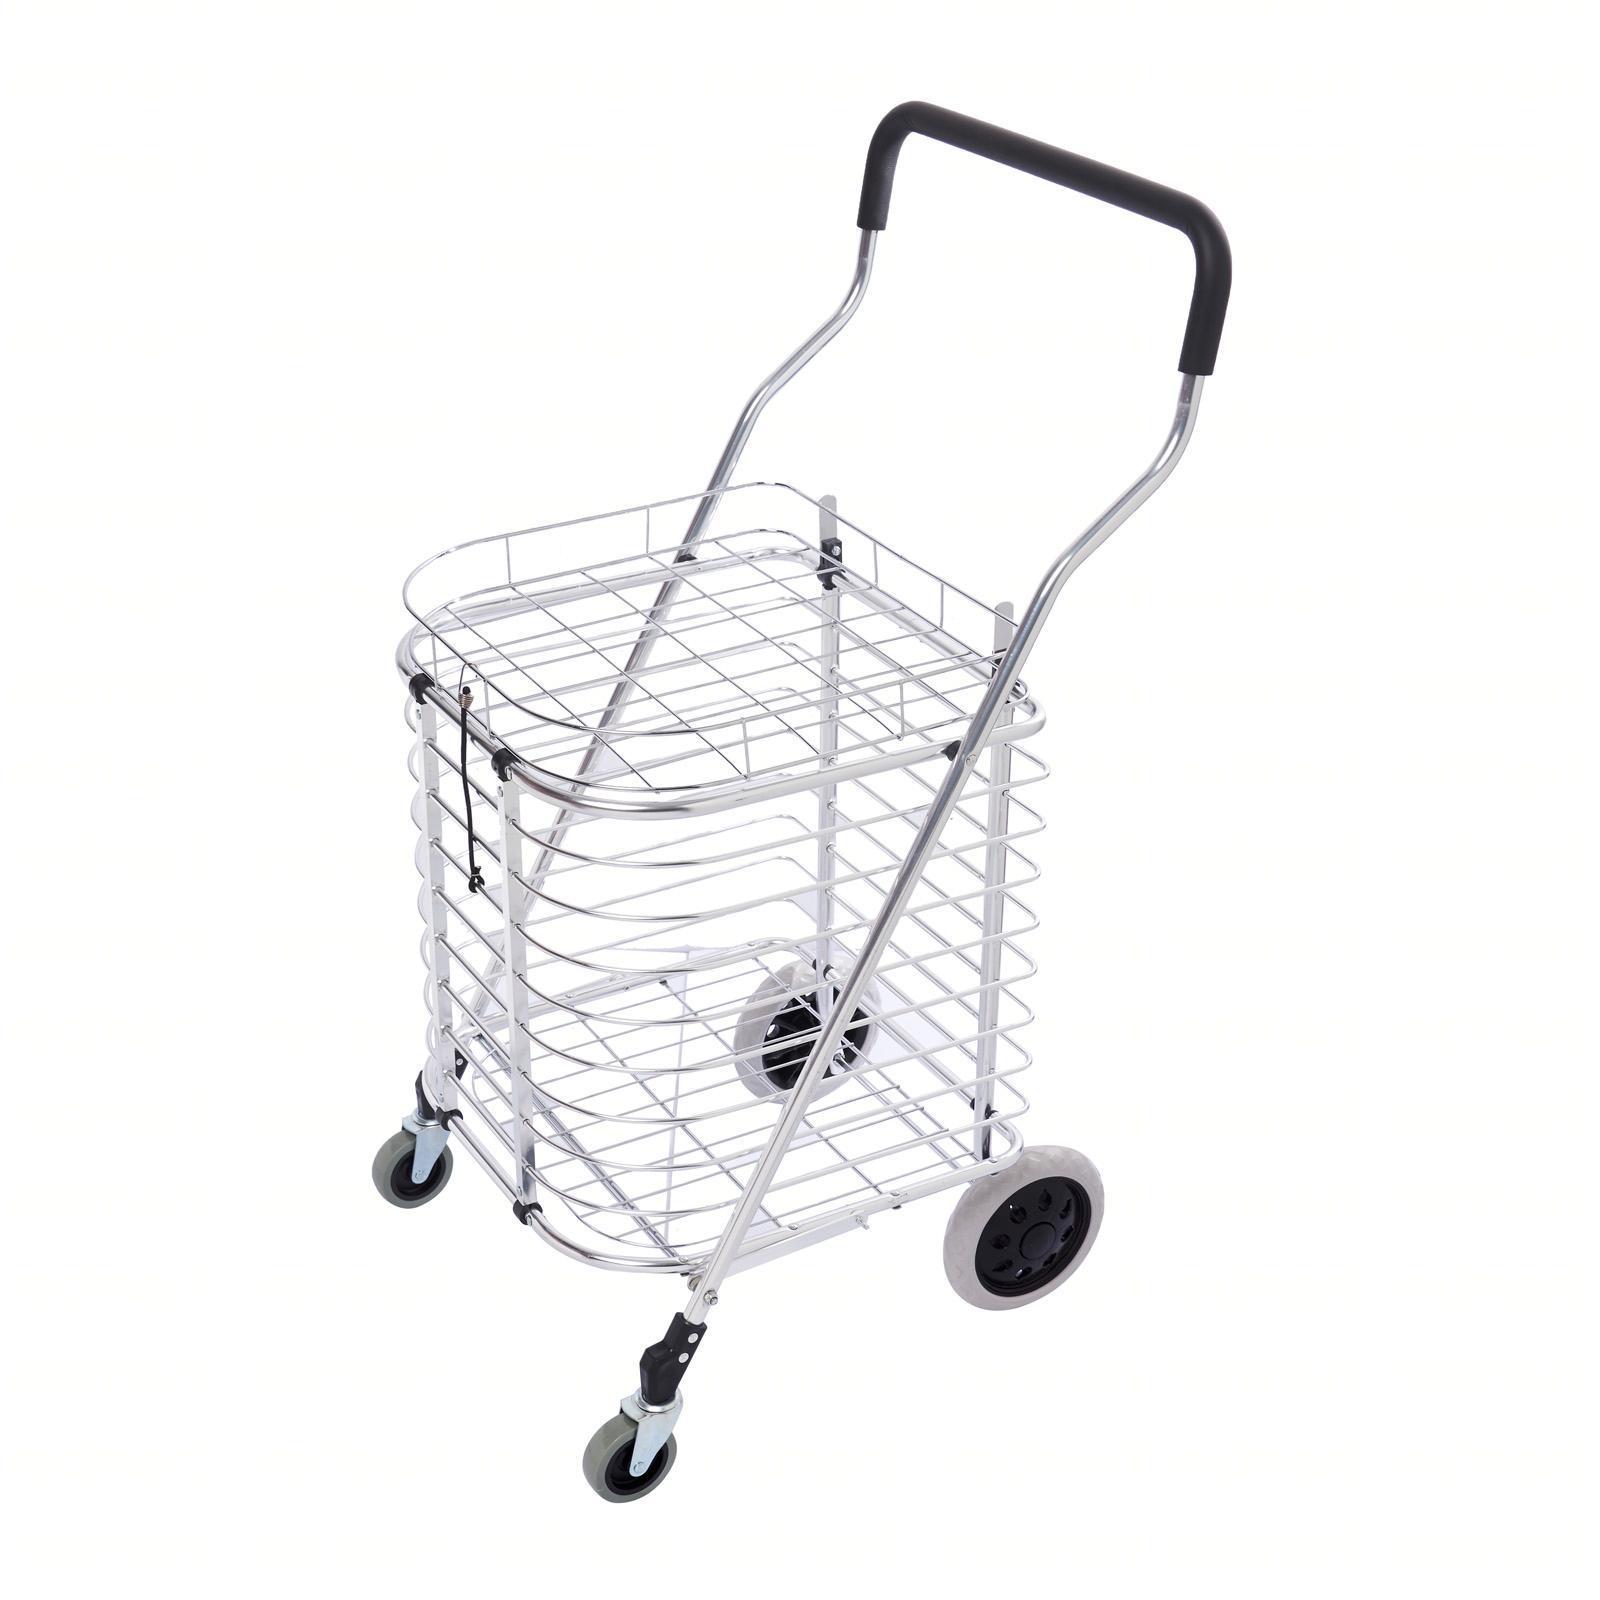 Leopard Aluminium Trolley Shopping Cart (L) 37.5x37.5x92 CM